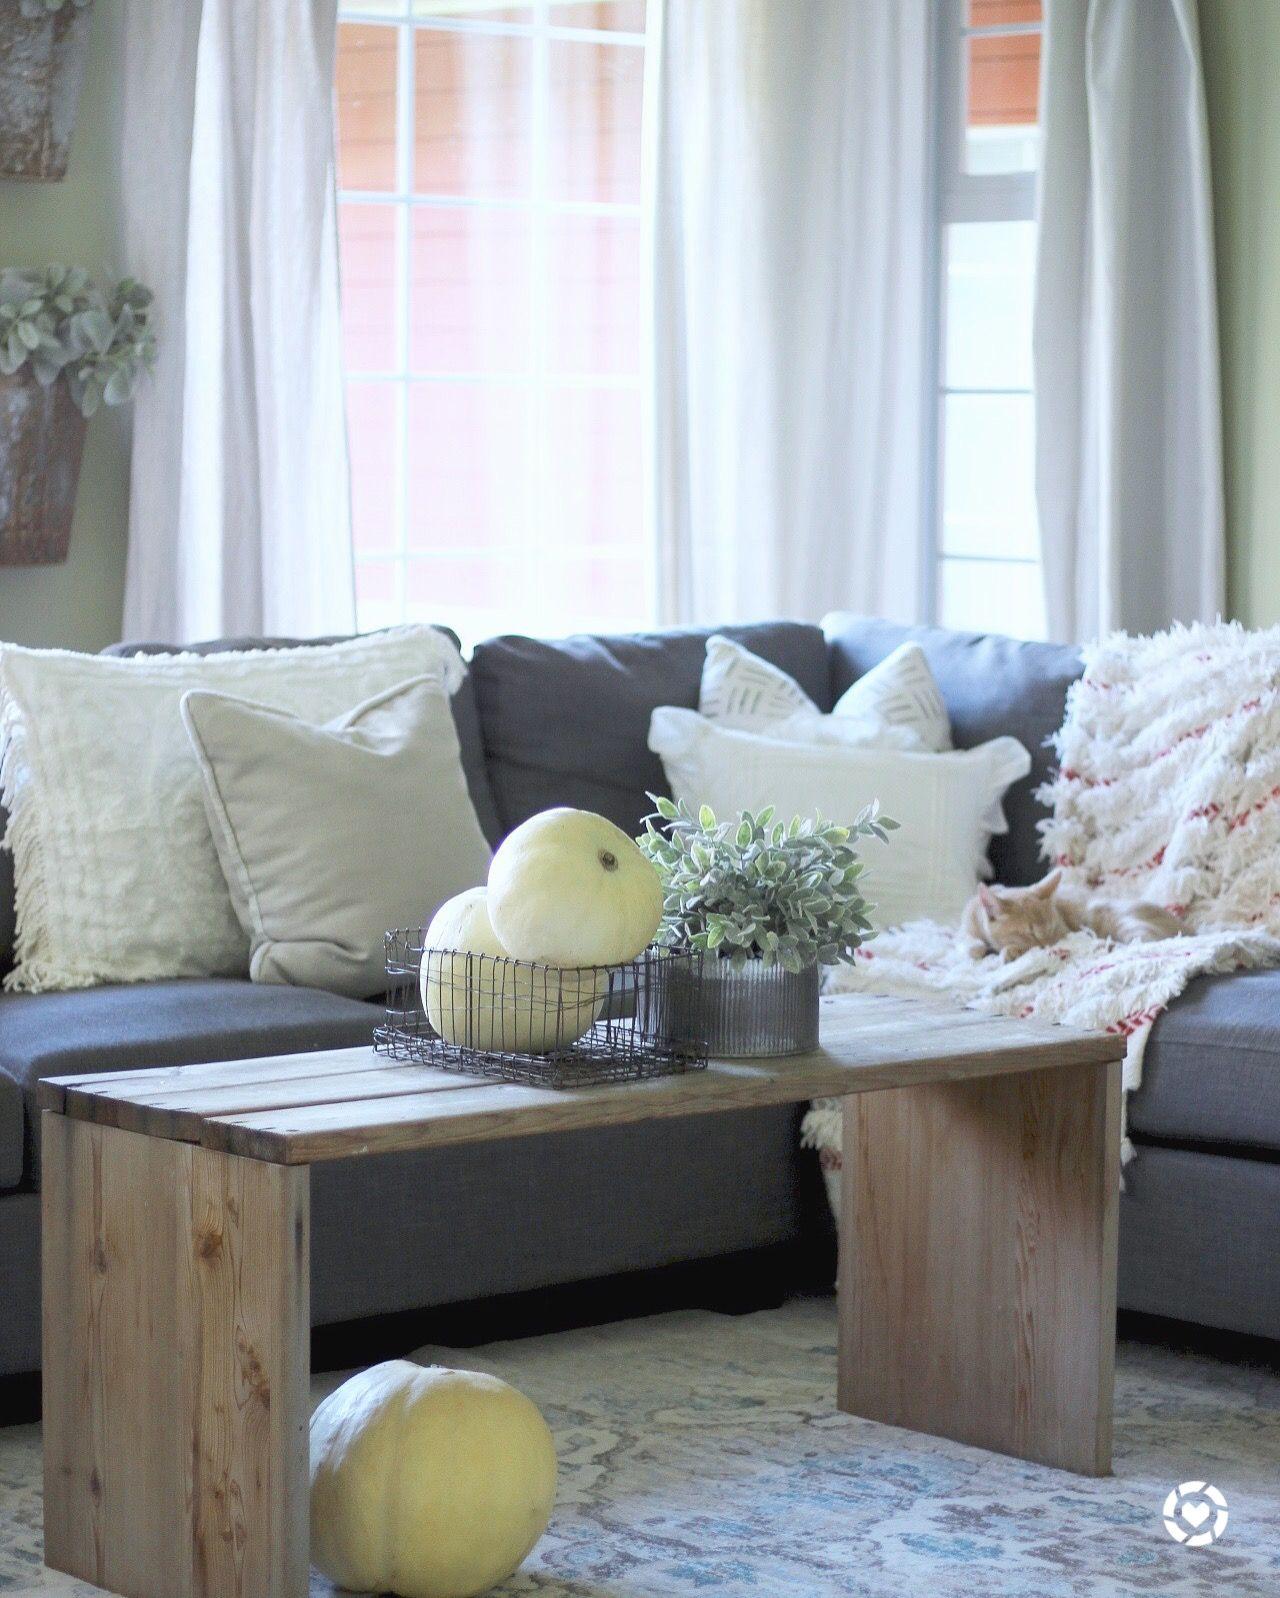 Fall Farmhouse Living Room Liketoknow It Http Liketk It 2tdv0  -> Casa Sala De Tv Sala De Jantar A Fazenda